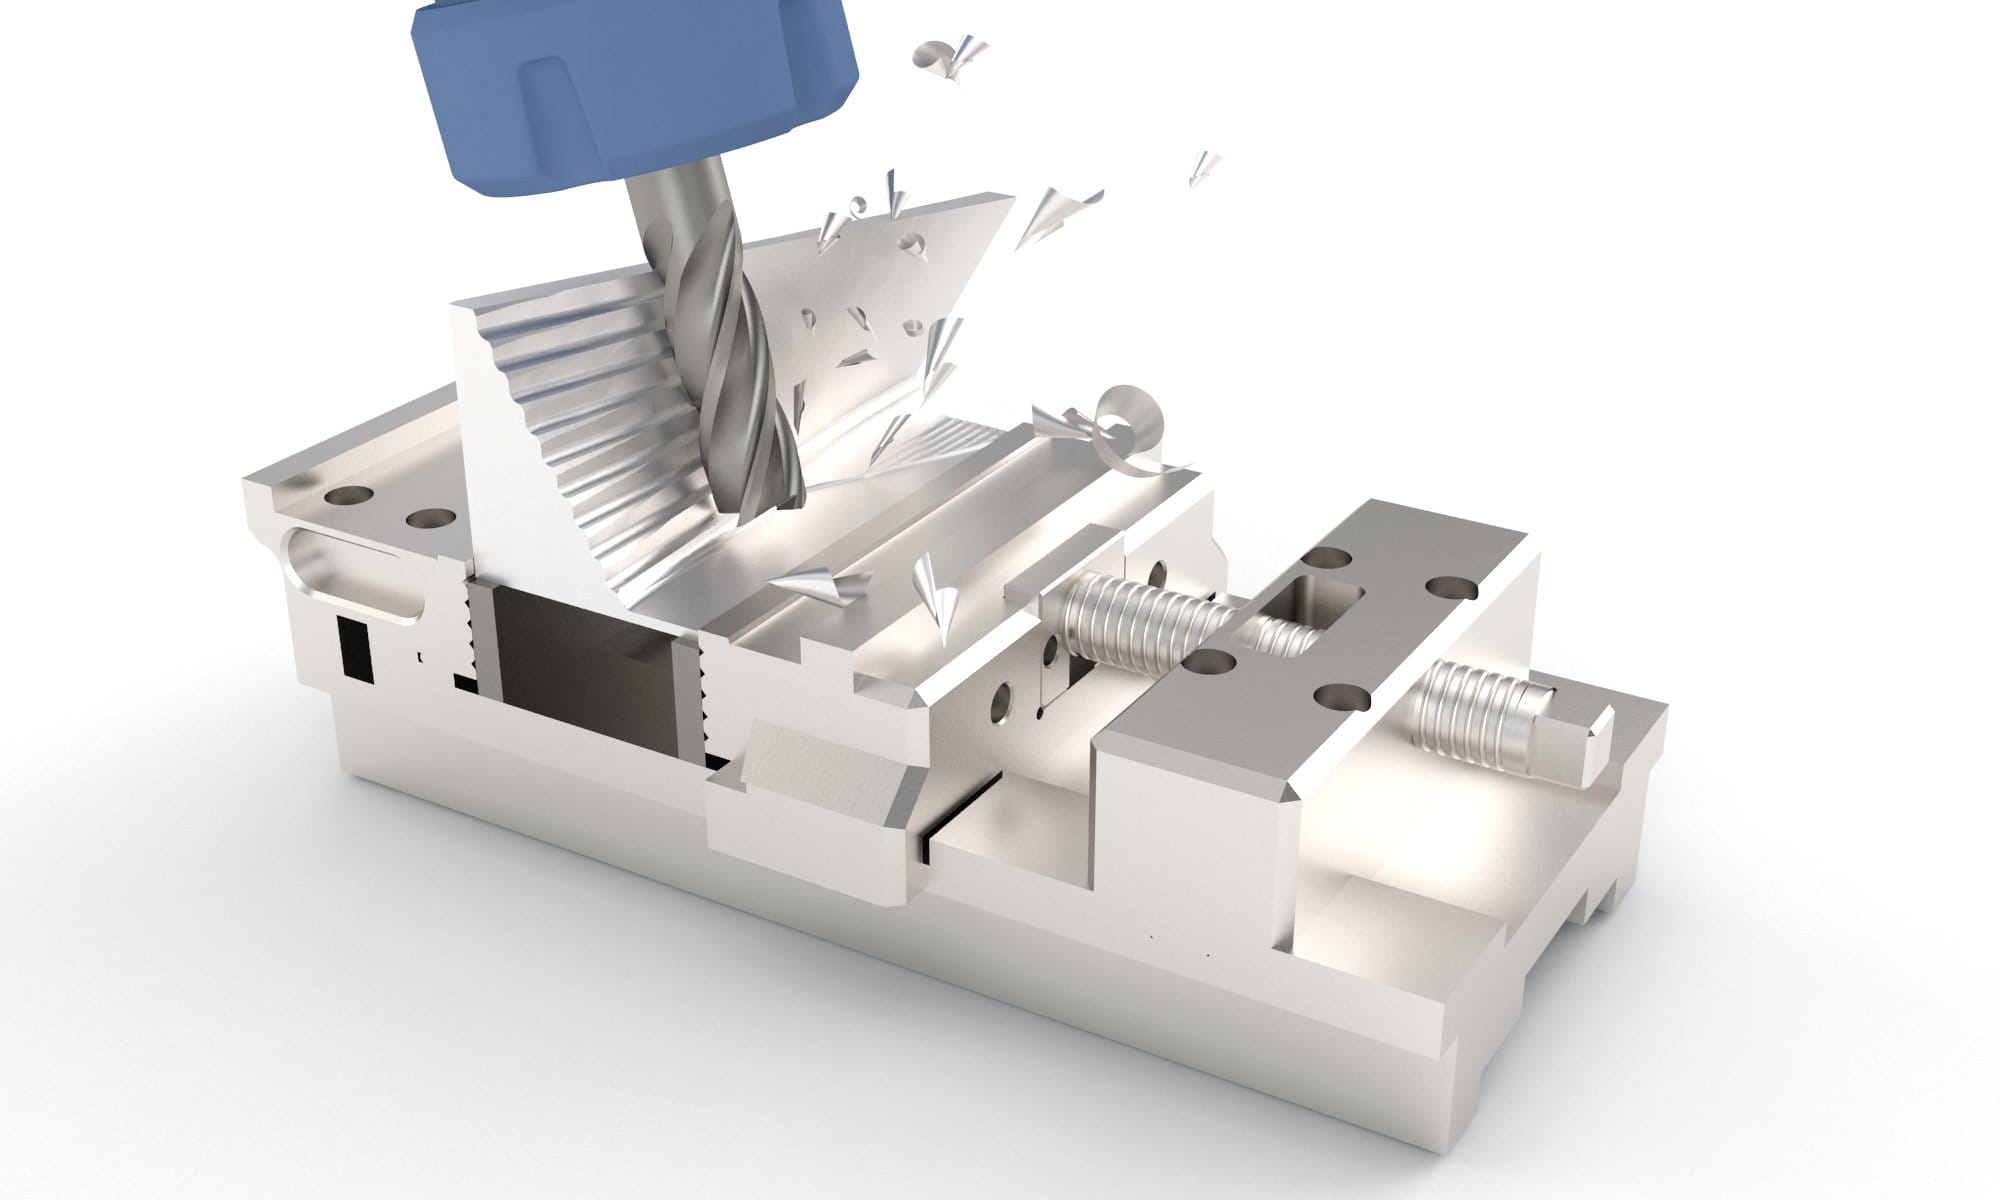 ModuleWorks_cnc_milling